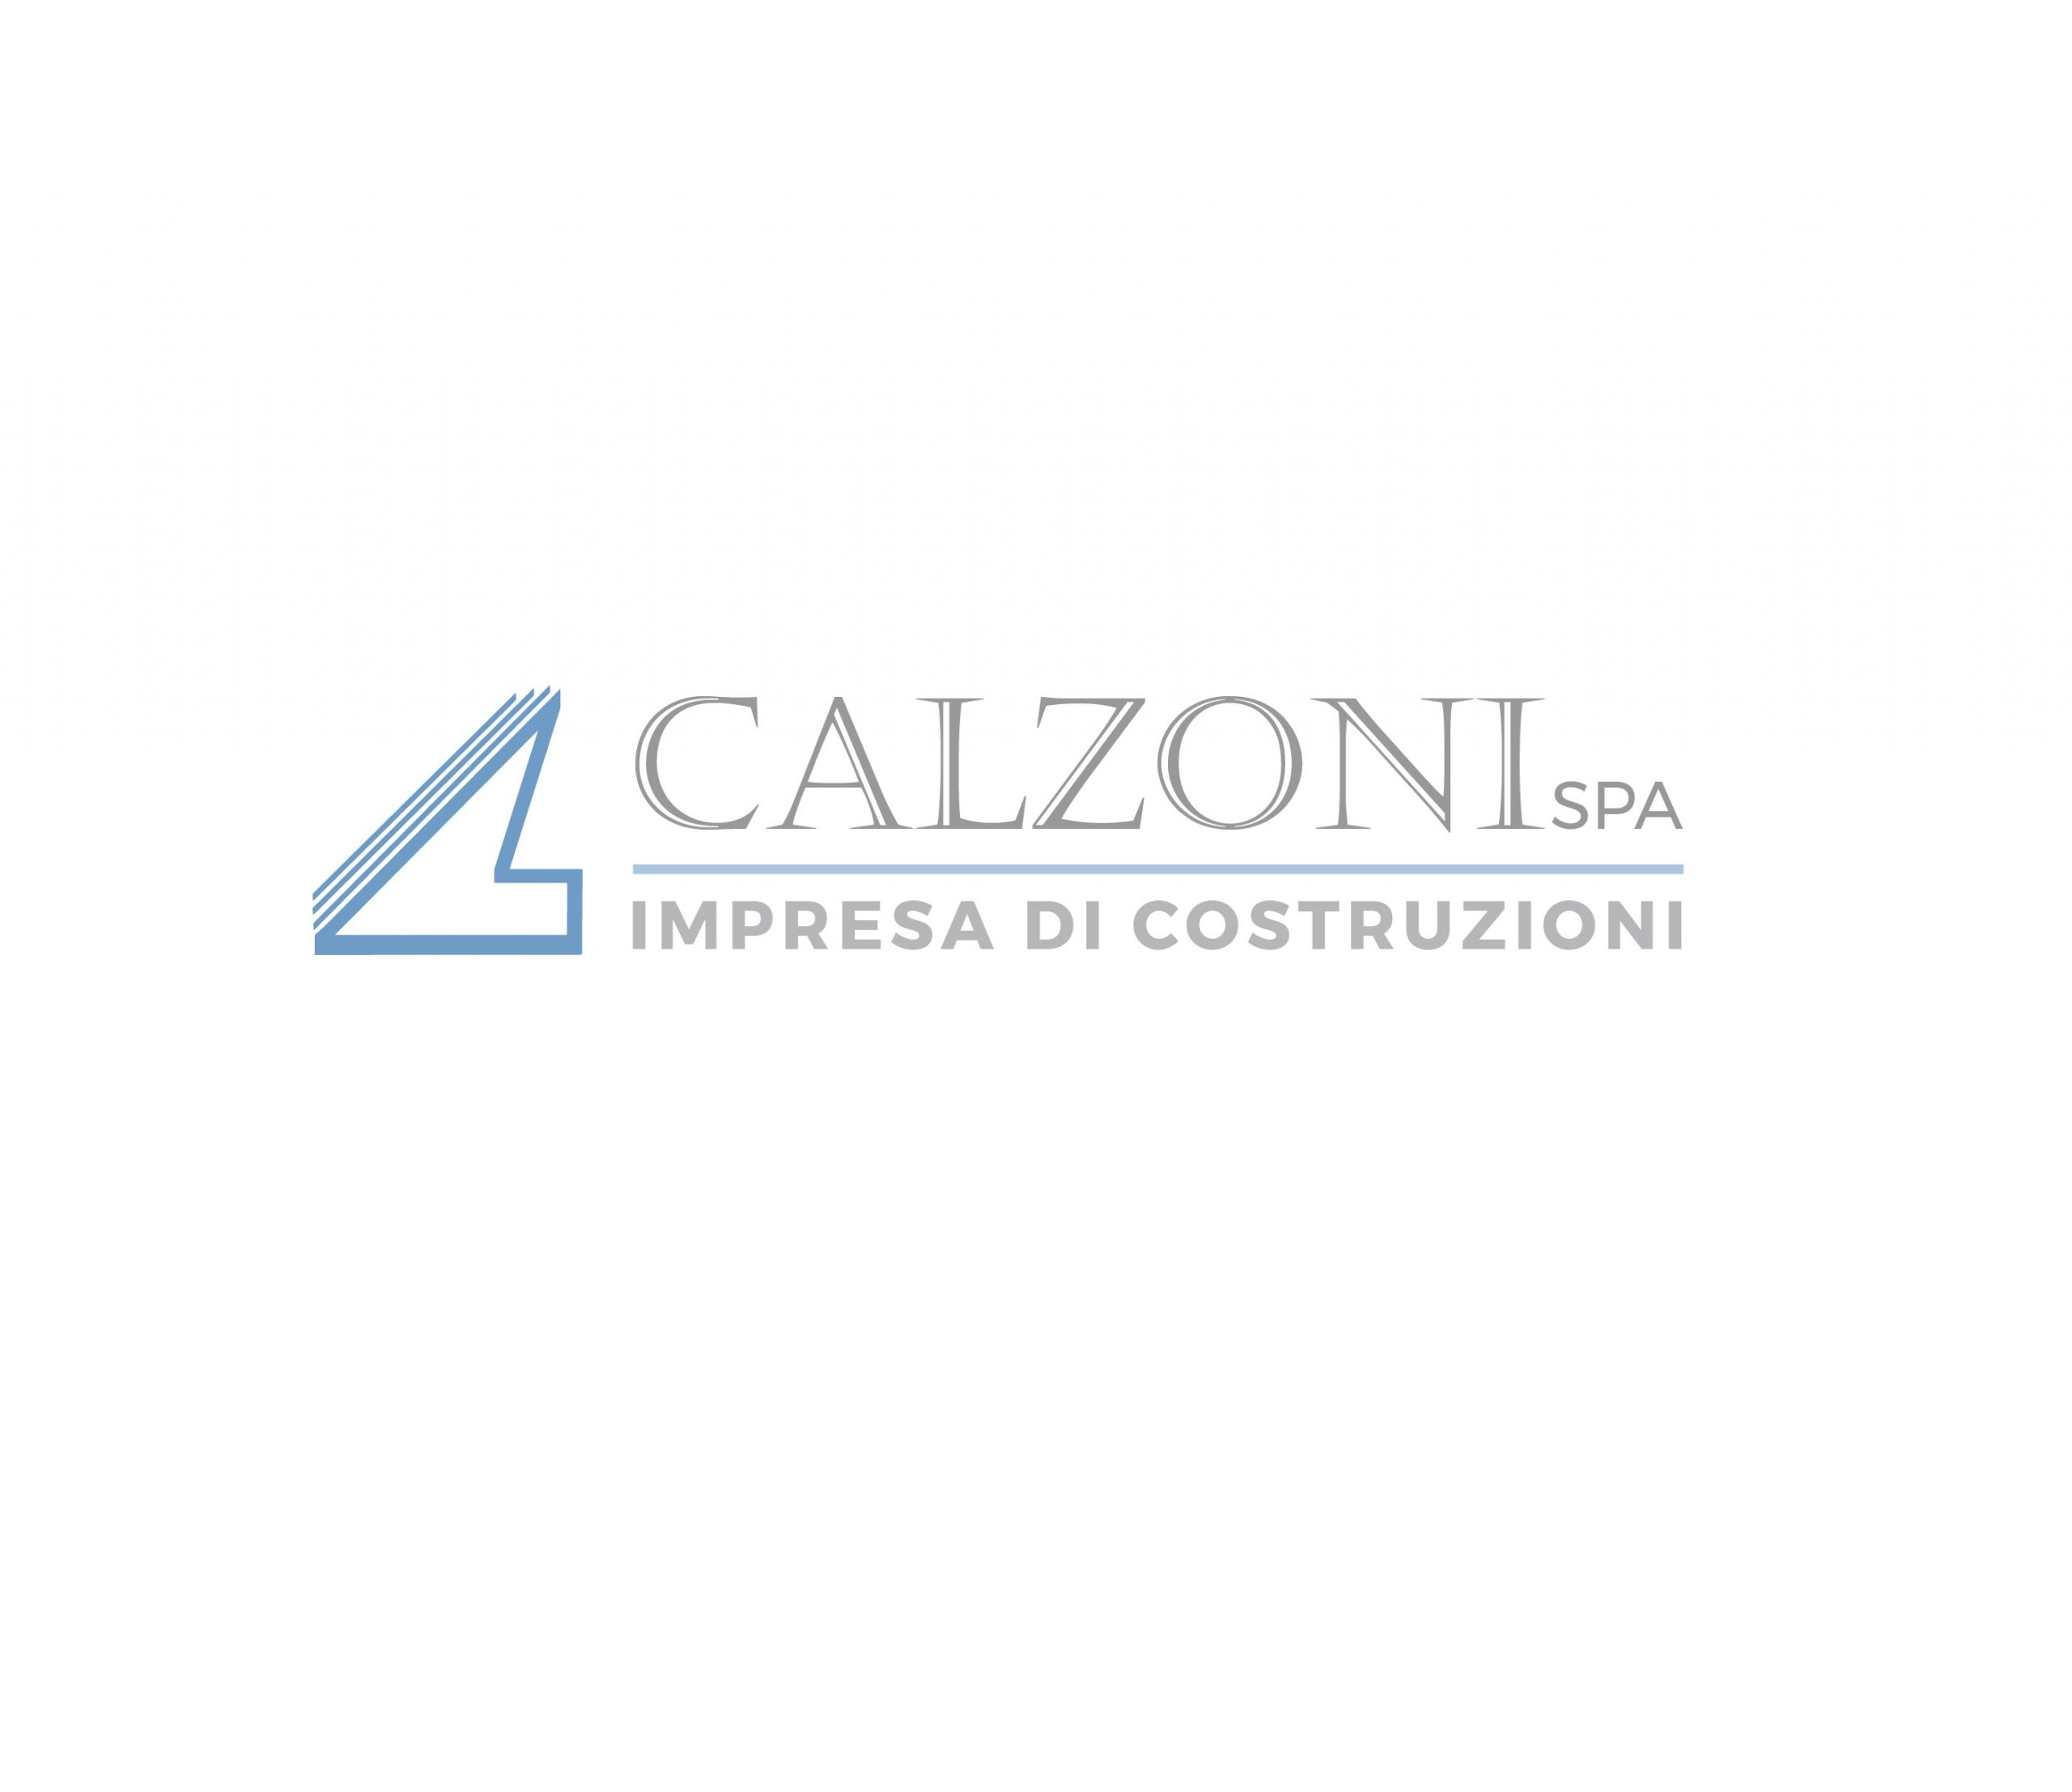 Calzoni SPA